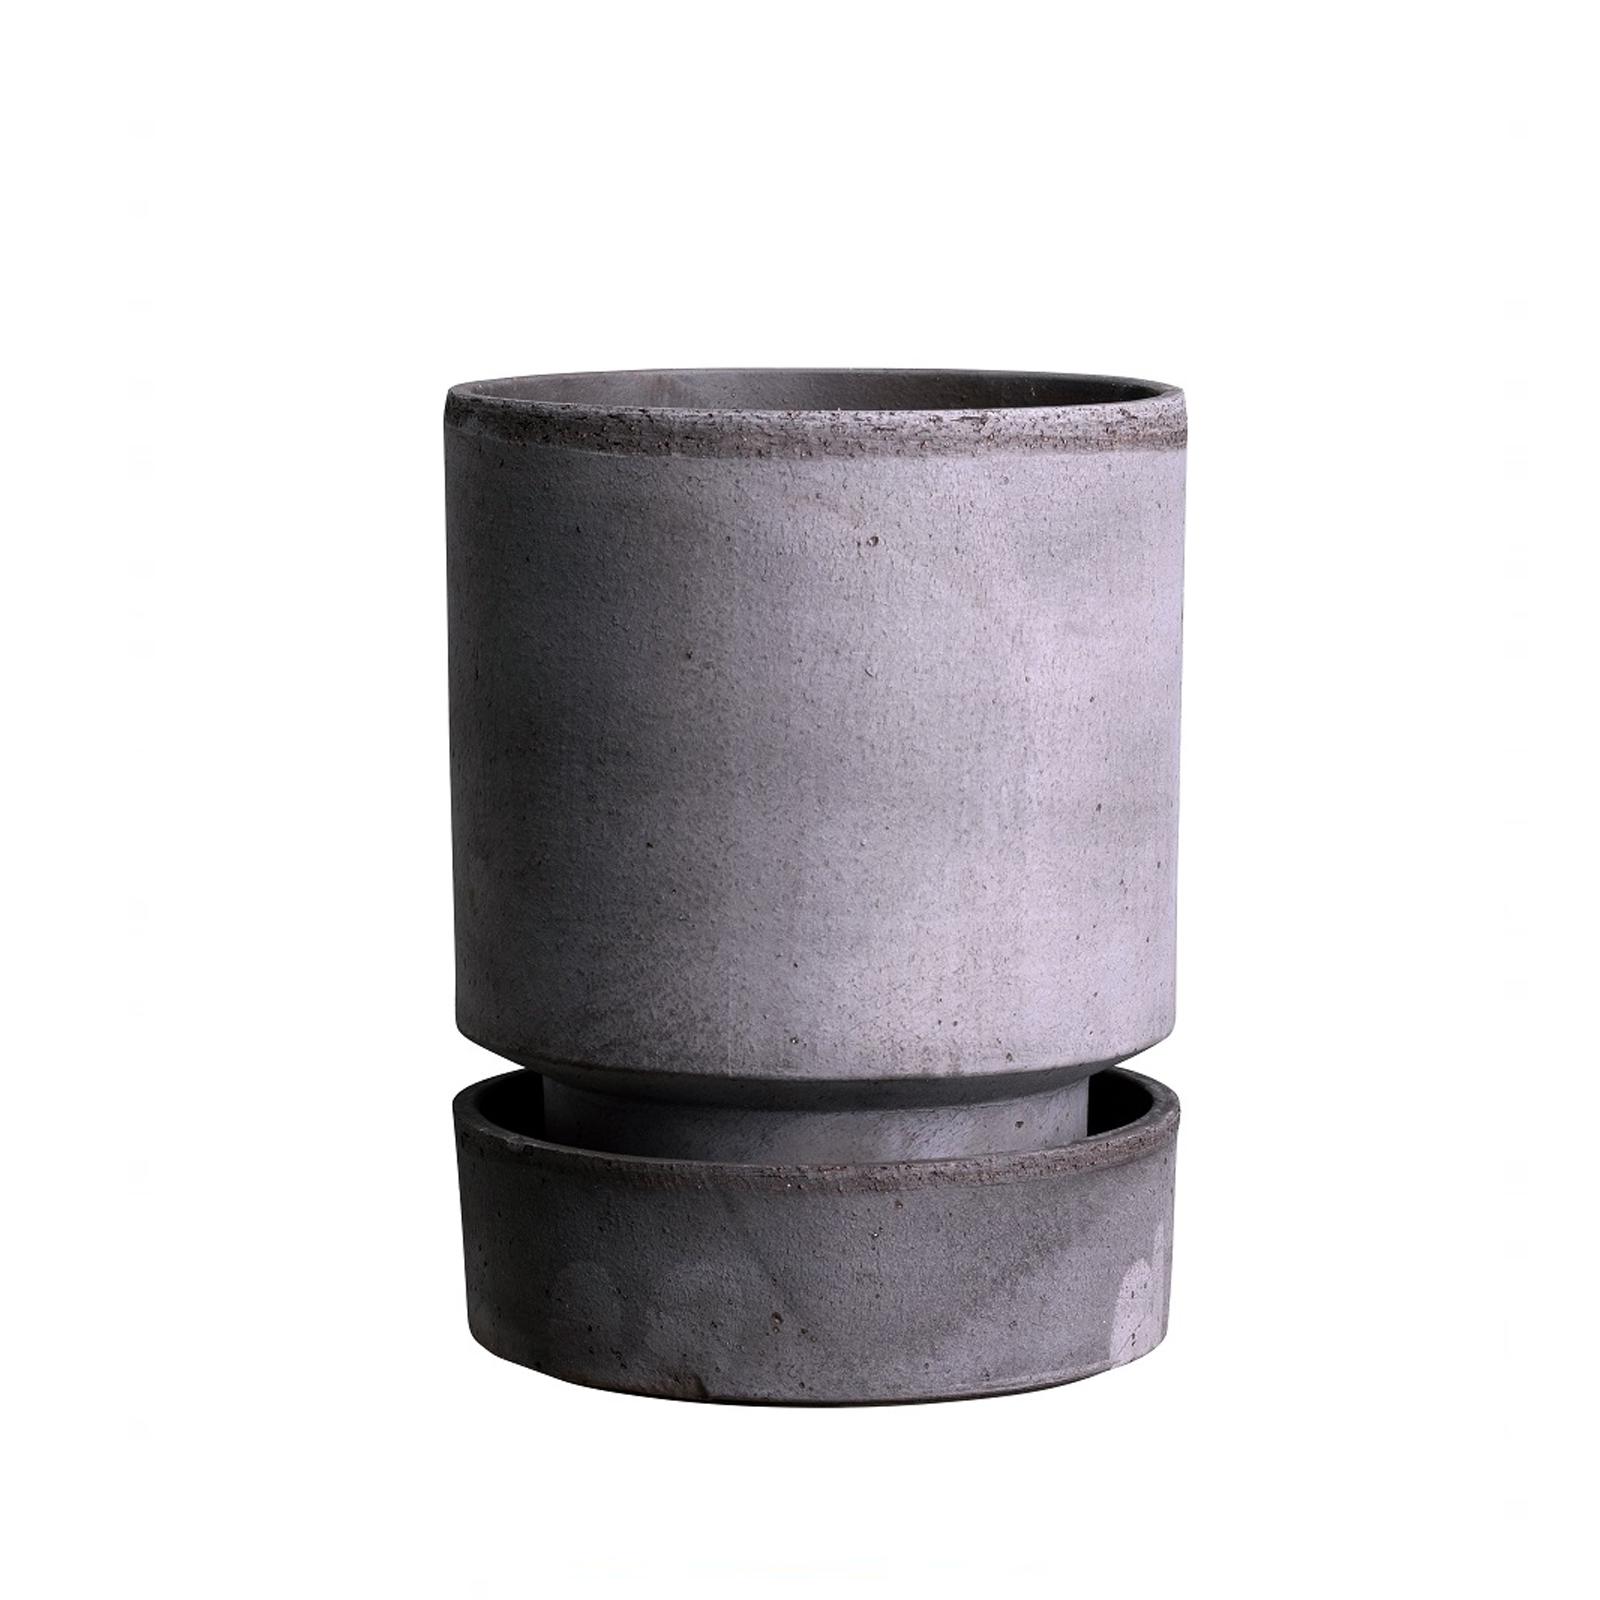 Kruka Hoff ø 14 cm, flera varianter - Bergs Potter